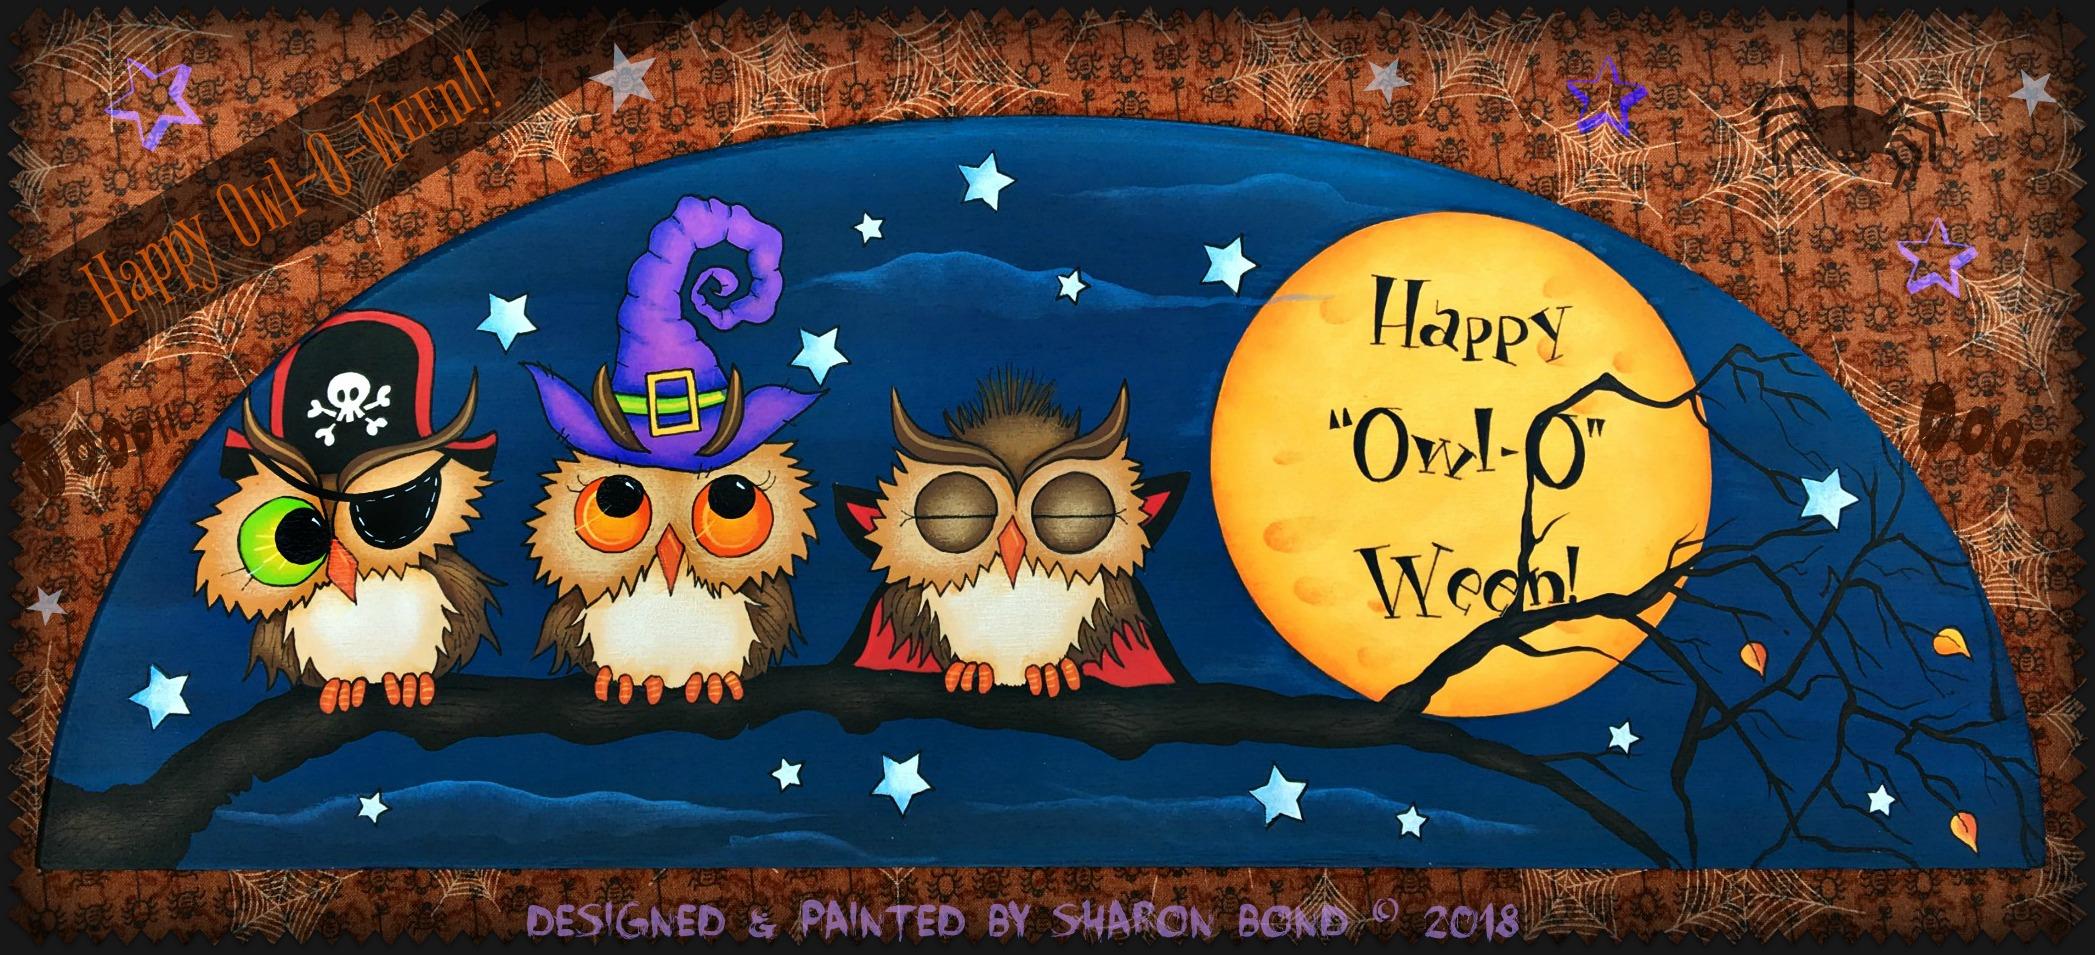 "Happy ""Owl-O"" Ween! - E-Packet - Sharon Bond"